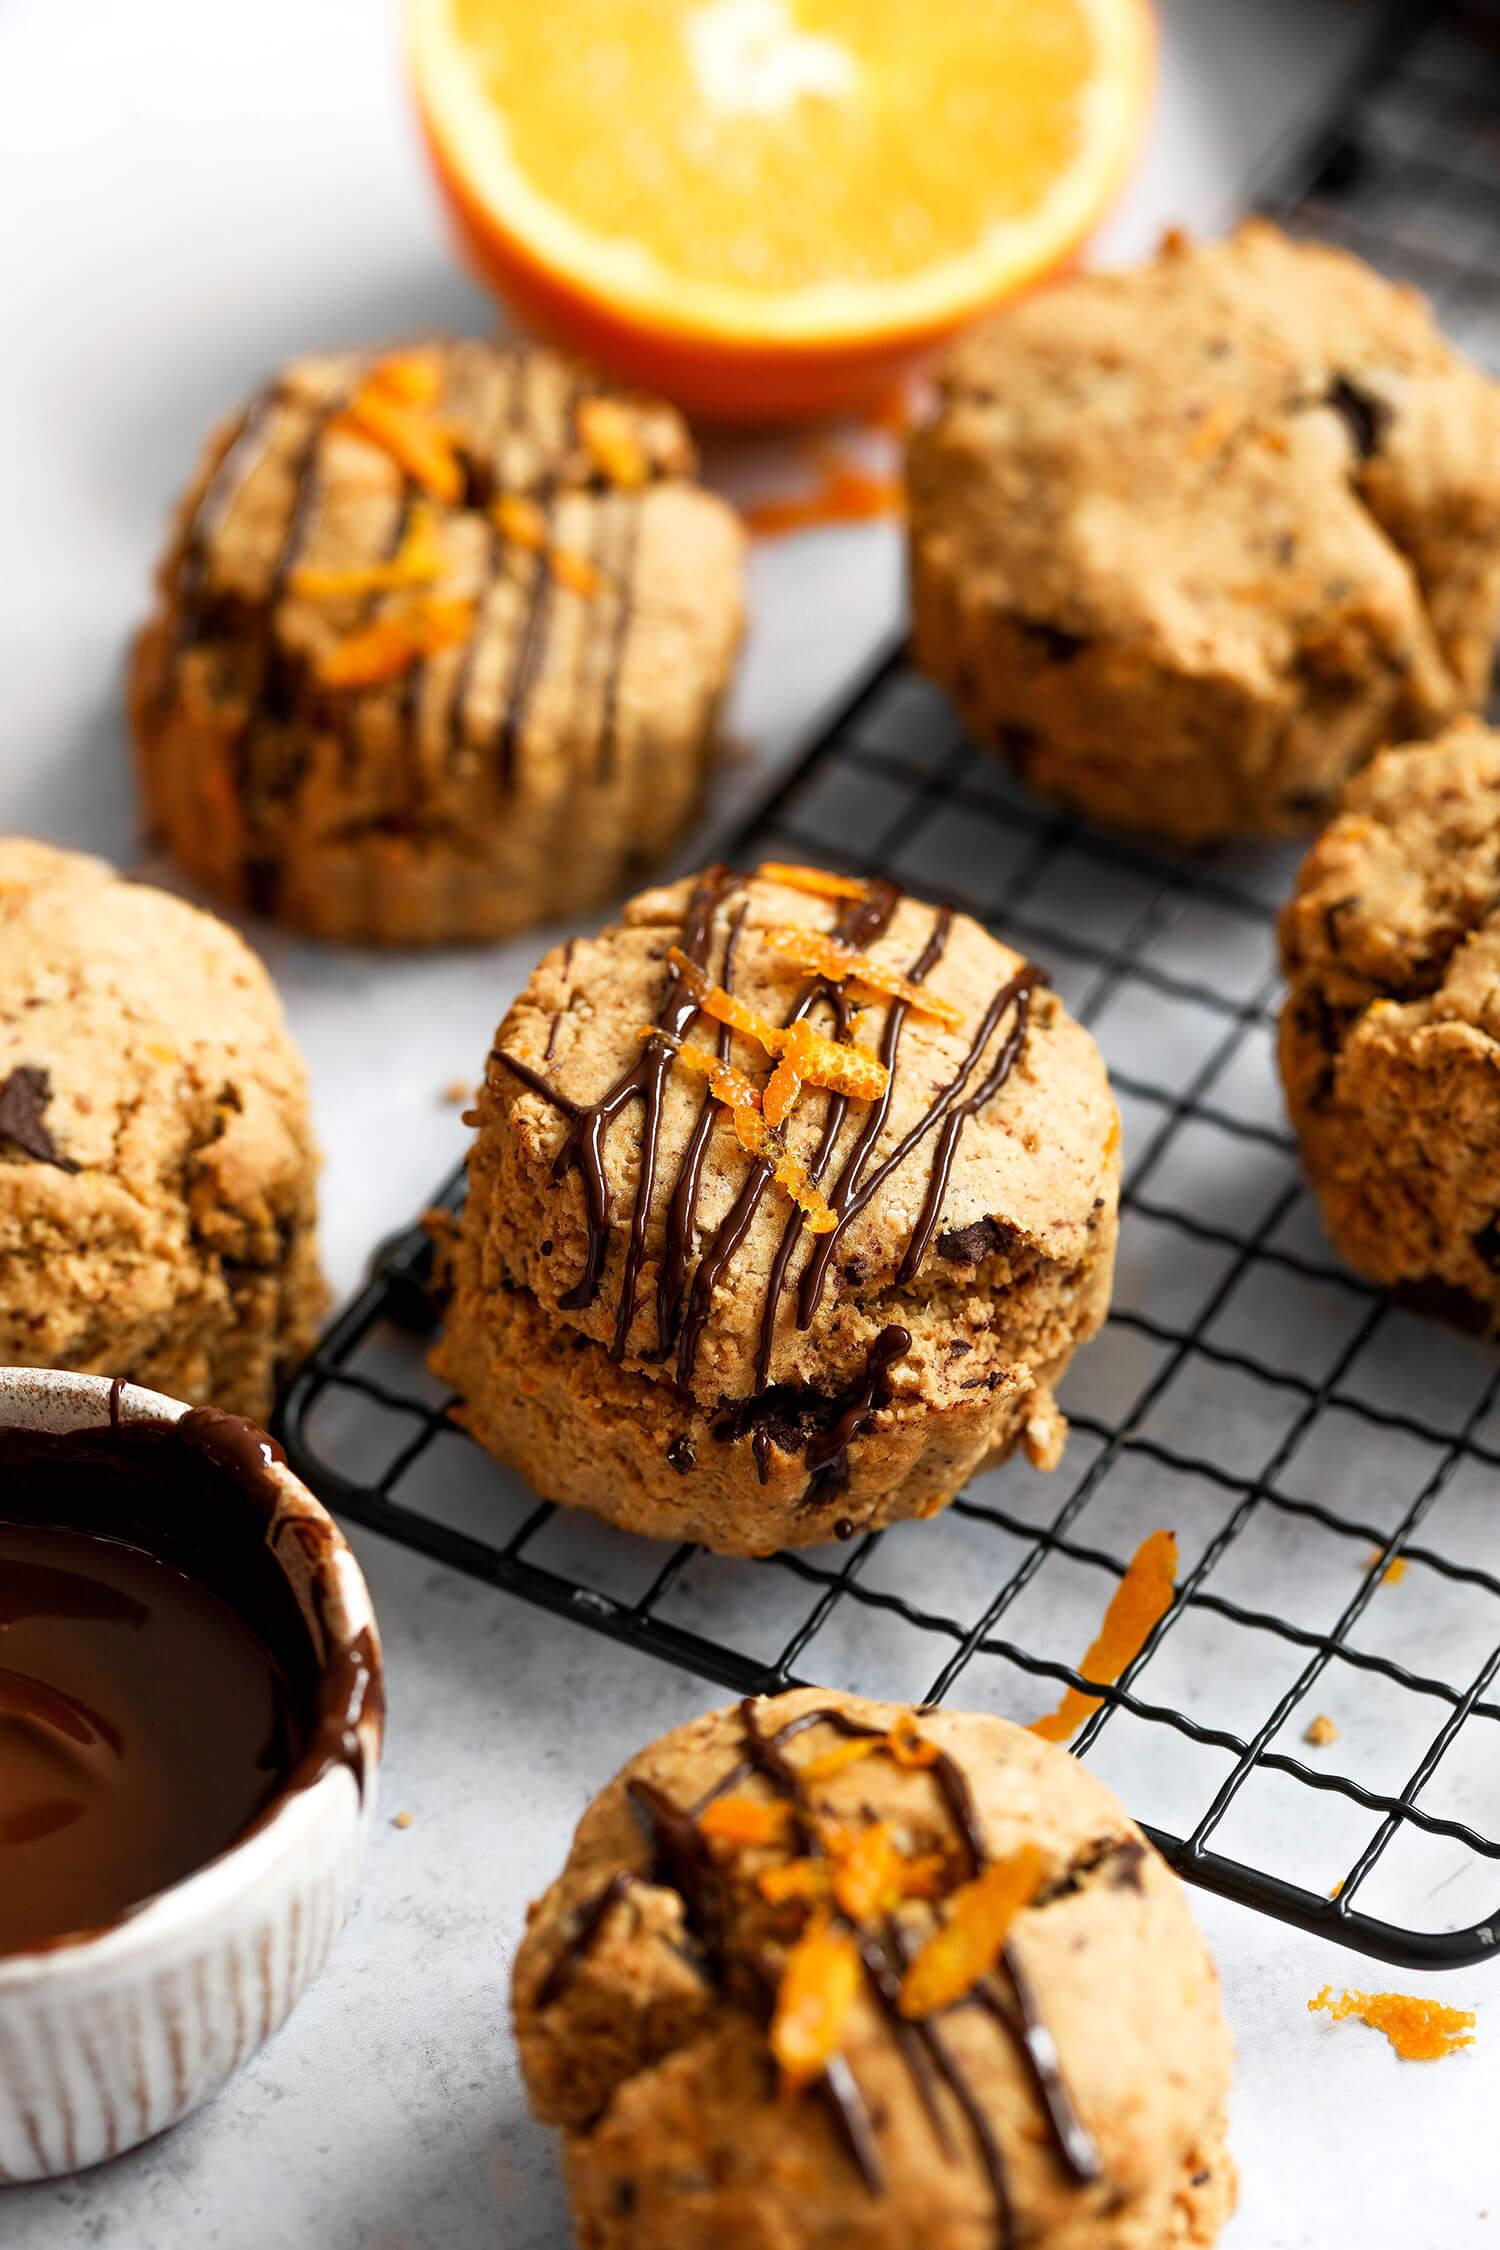 Festive Chocolate Orange Scones Vegan & Gluten-free